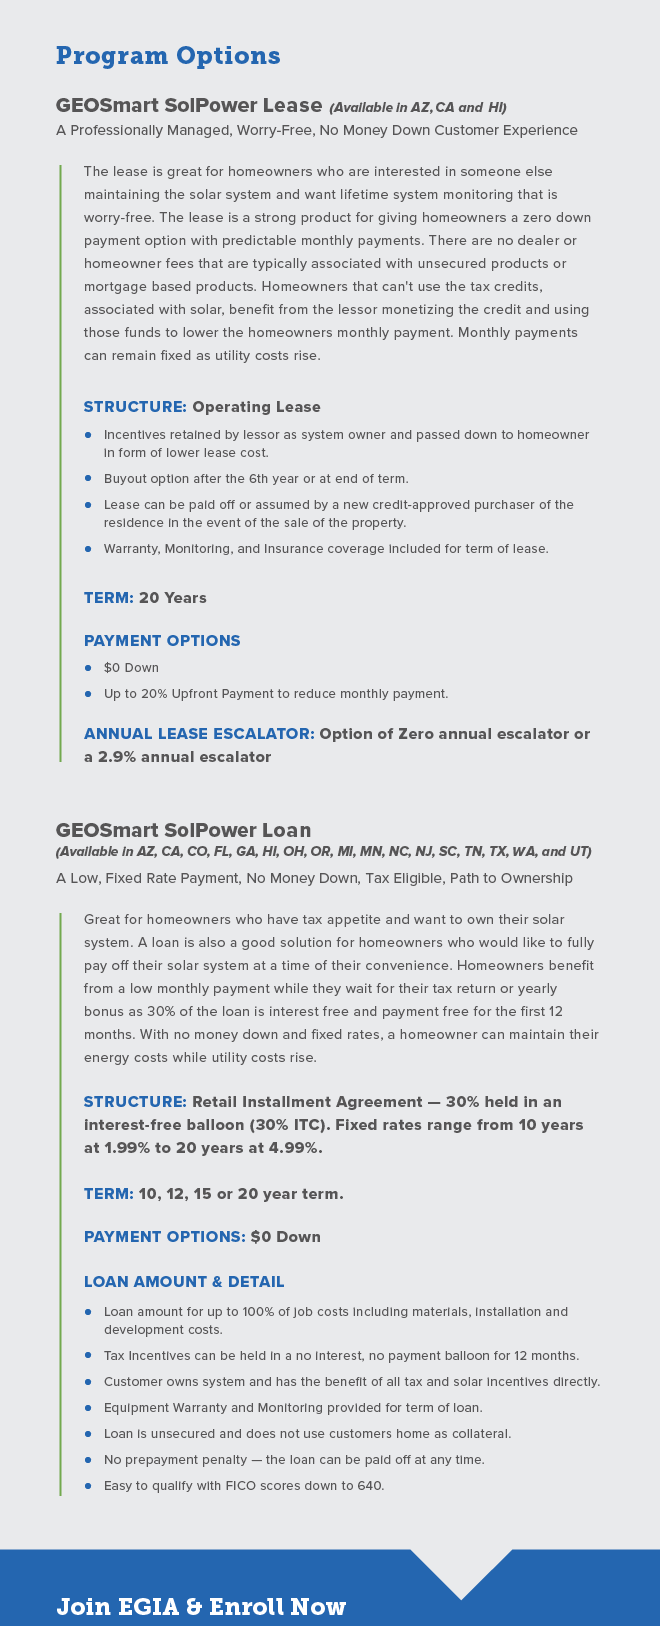 Introducing the new GEOSmart SolPower Program